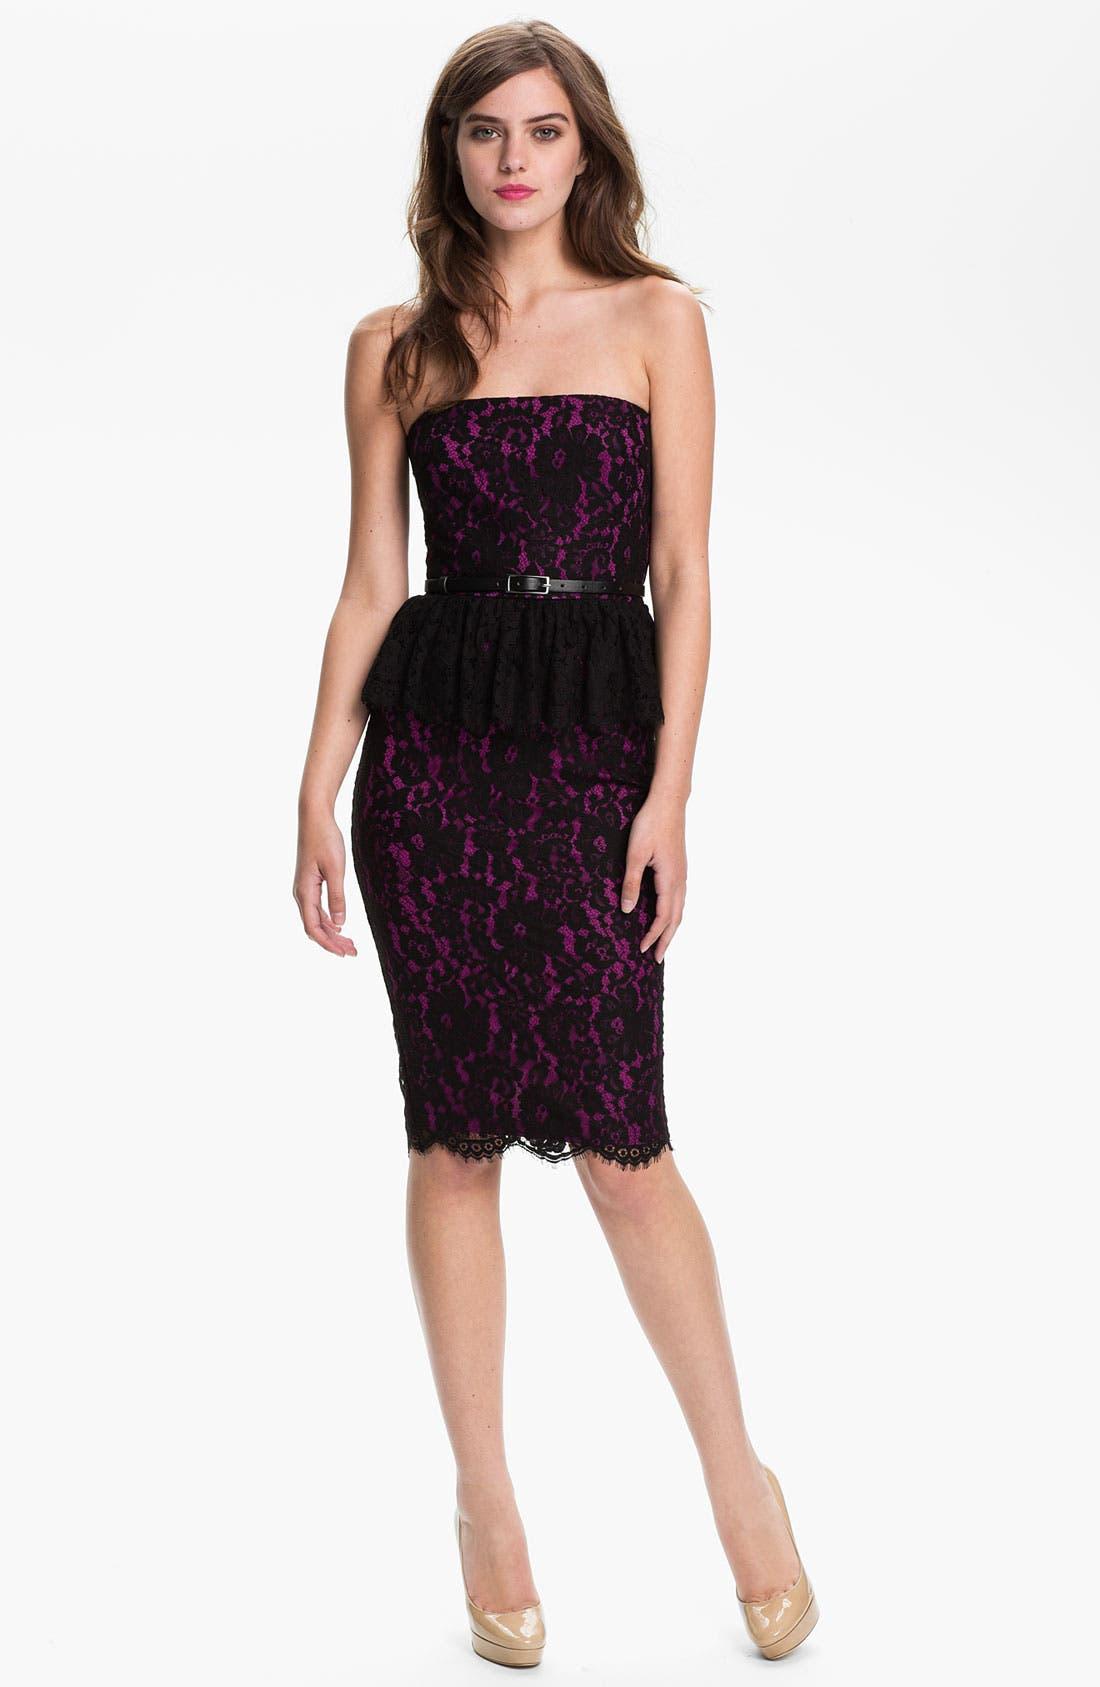 Alternate Image 1 Selected - Robert Rodriguez Strapless Lace Peplum Dress